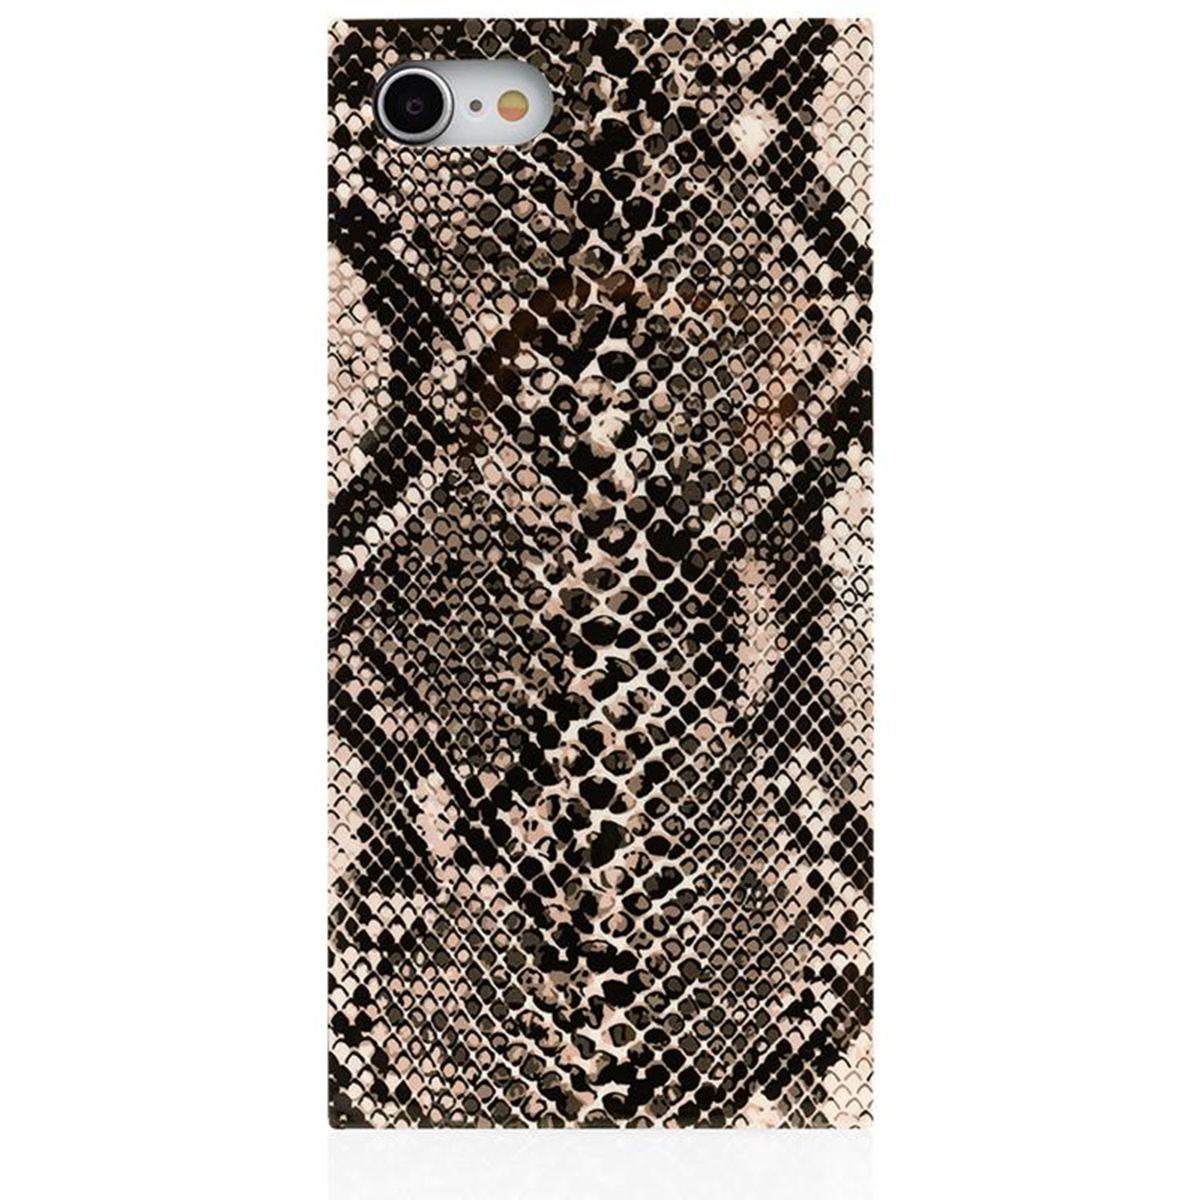 iDecoz Python Phone Case iPhone X/XS